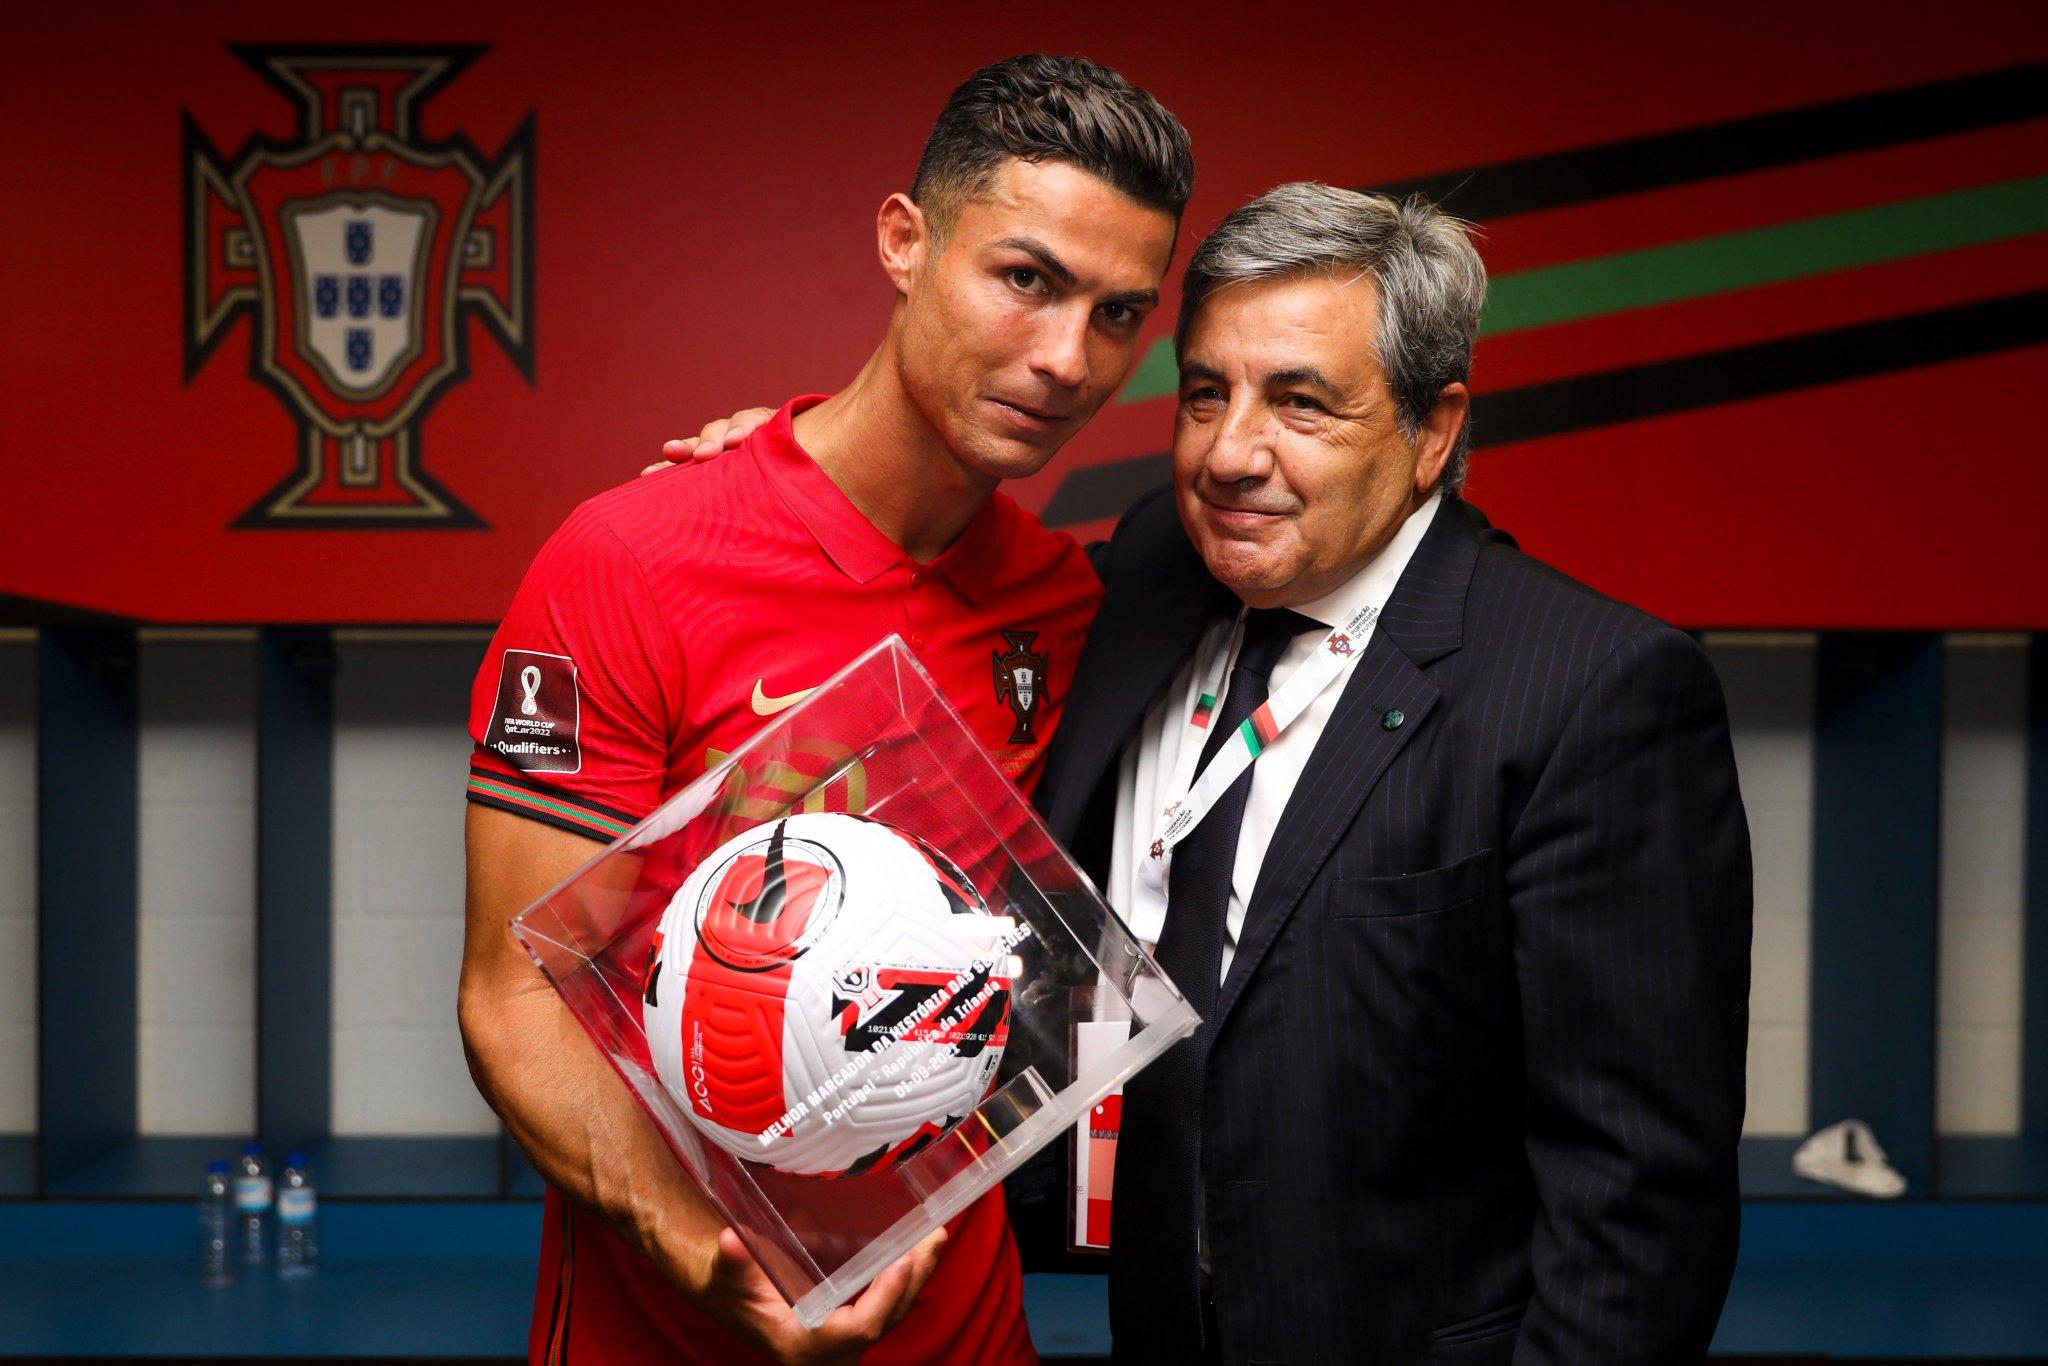 Ronaldo with his historic goal ball